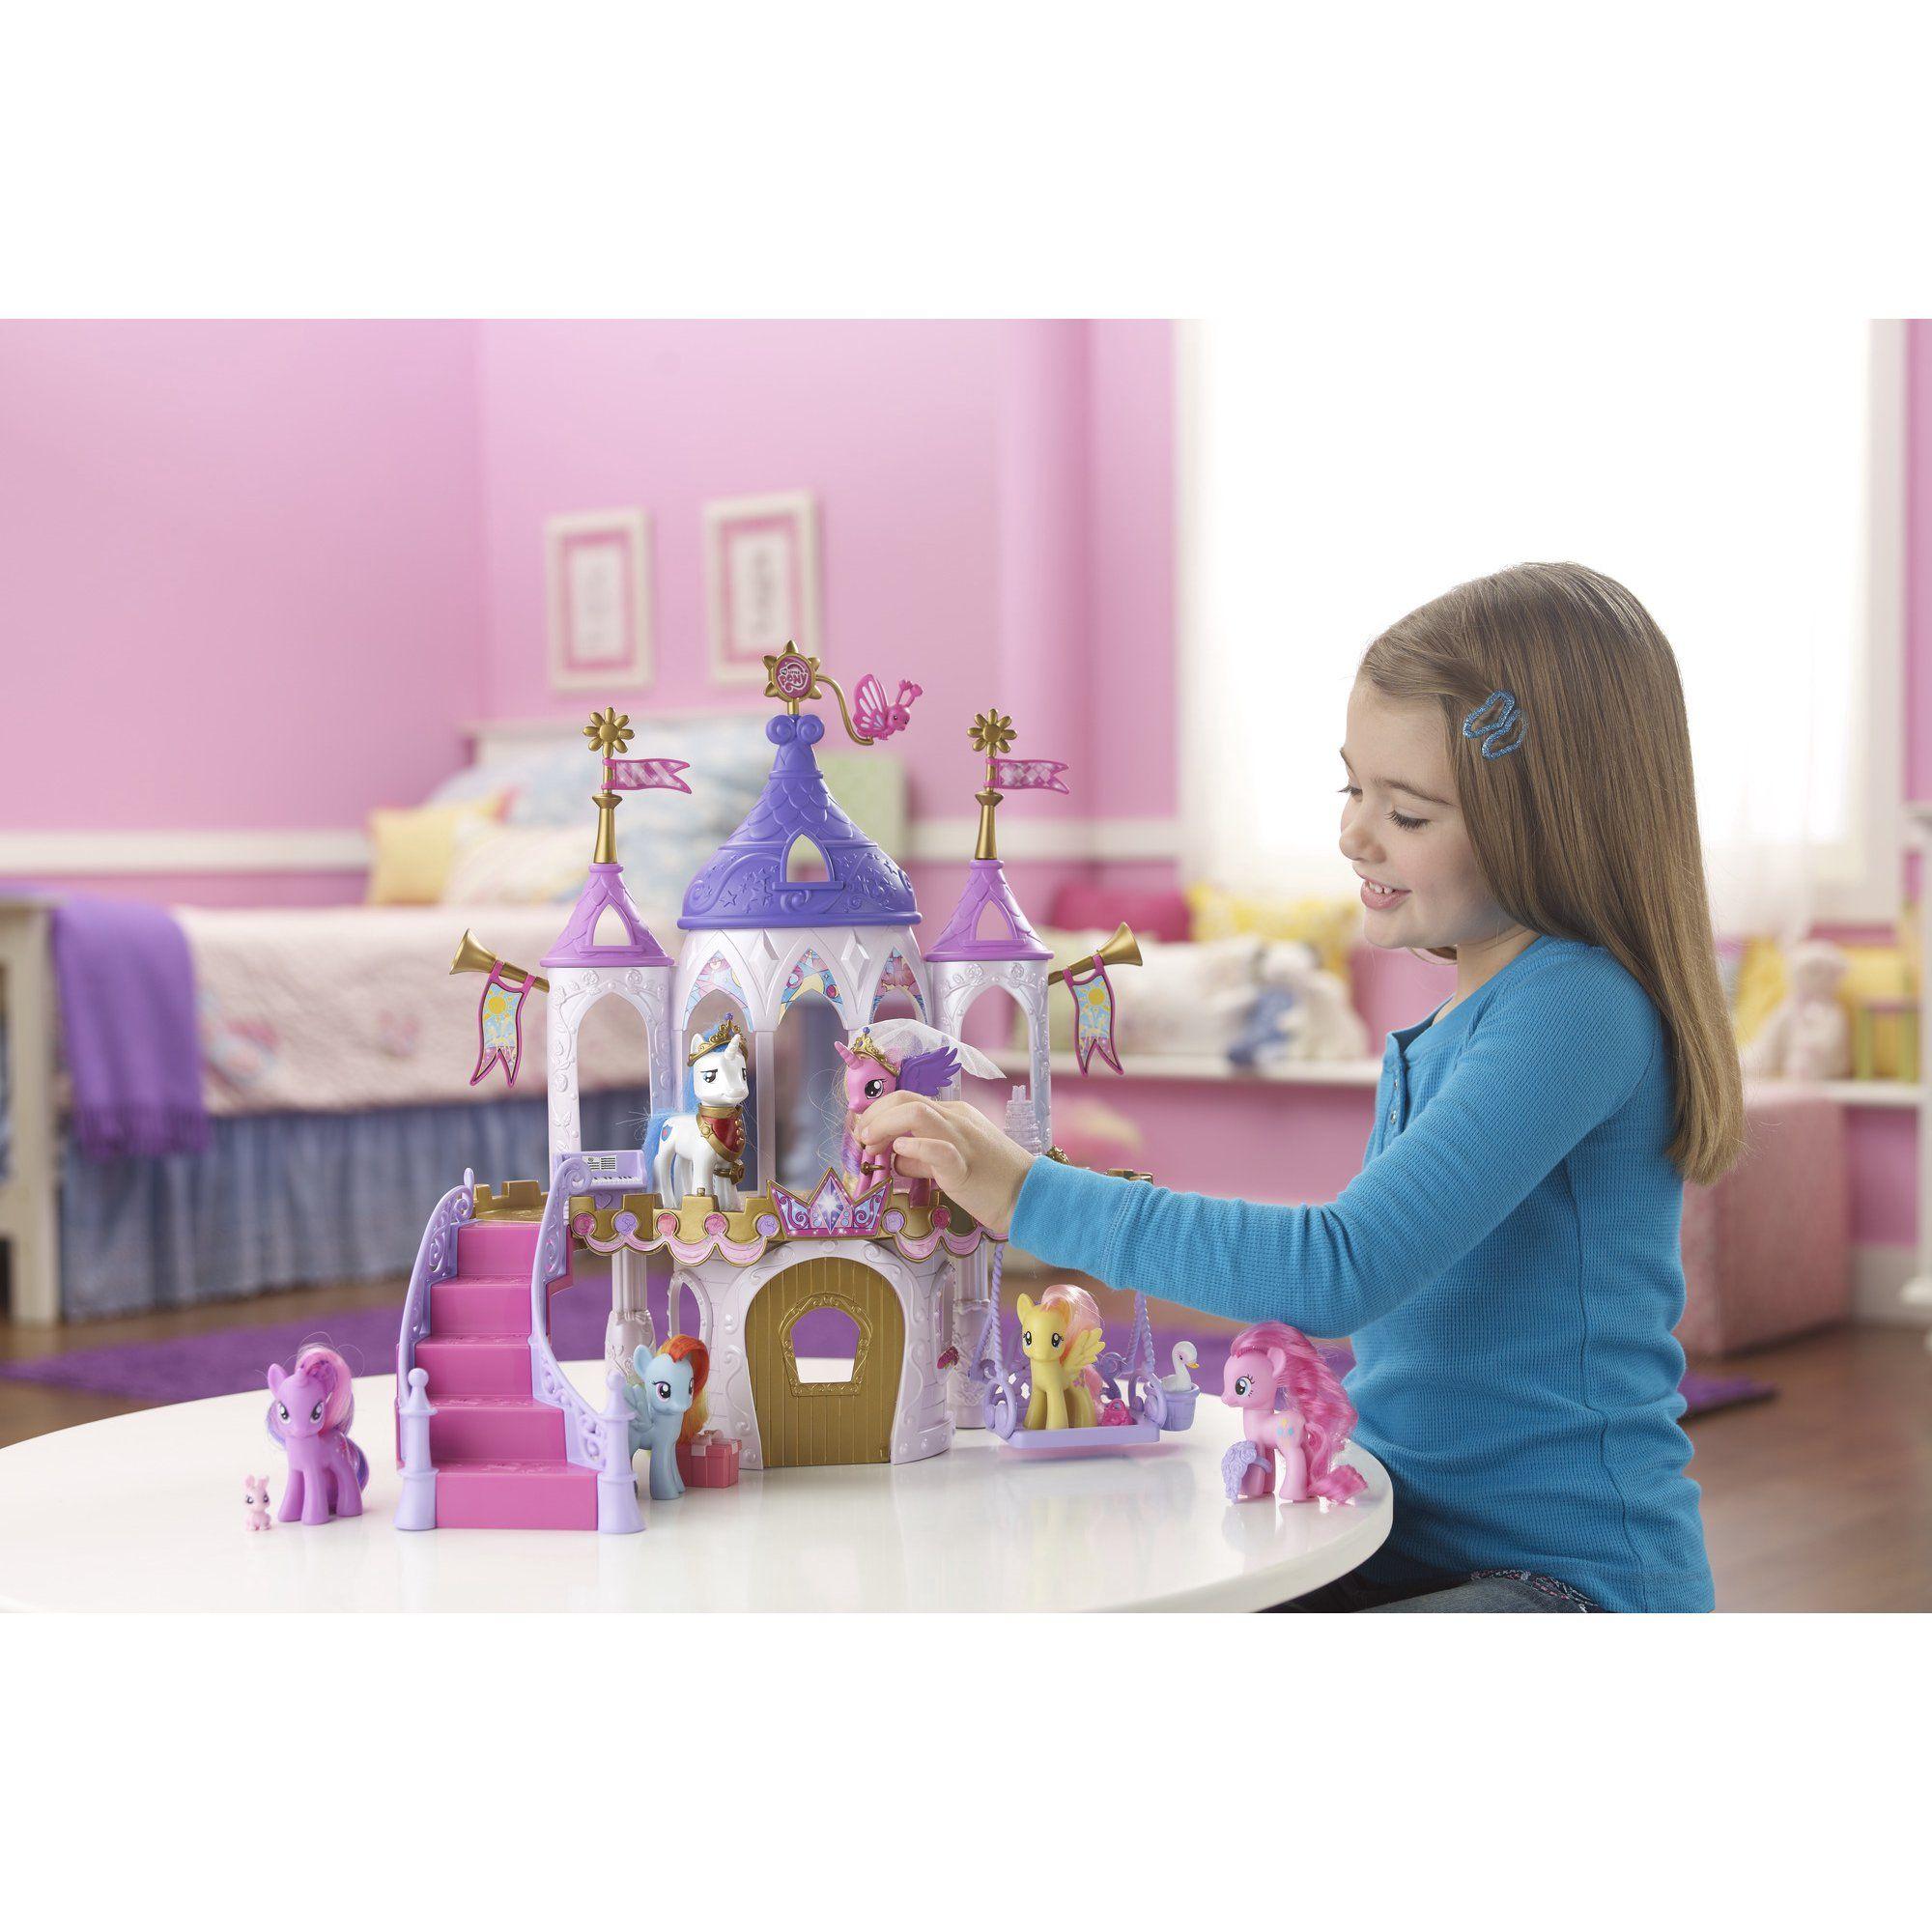 My Little Pony Pony Princess Wedding Castle Playset Walmart Com In 2020 My Little Pony My Little Pony Princess Castle Wedding